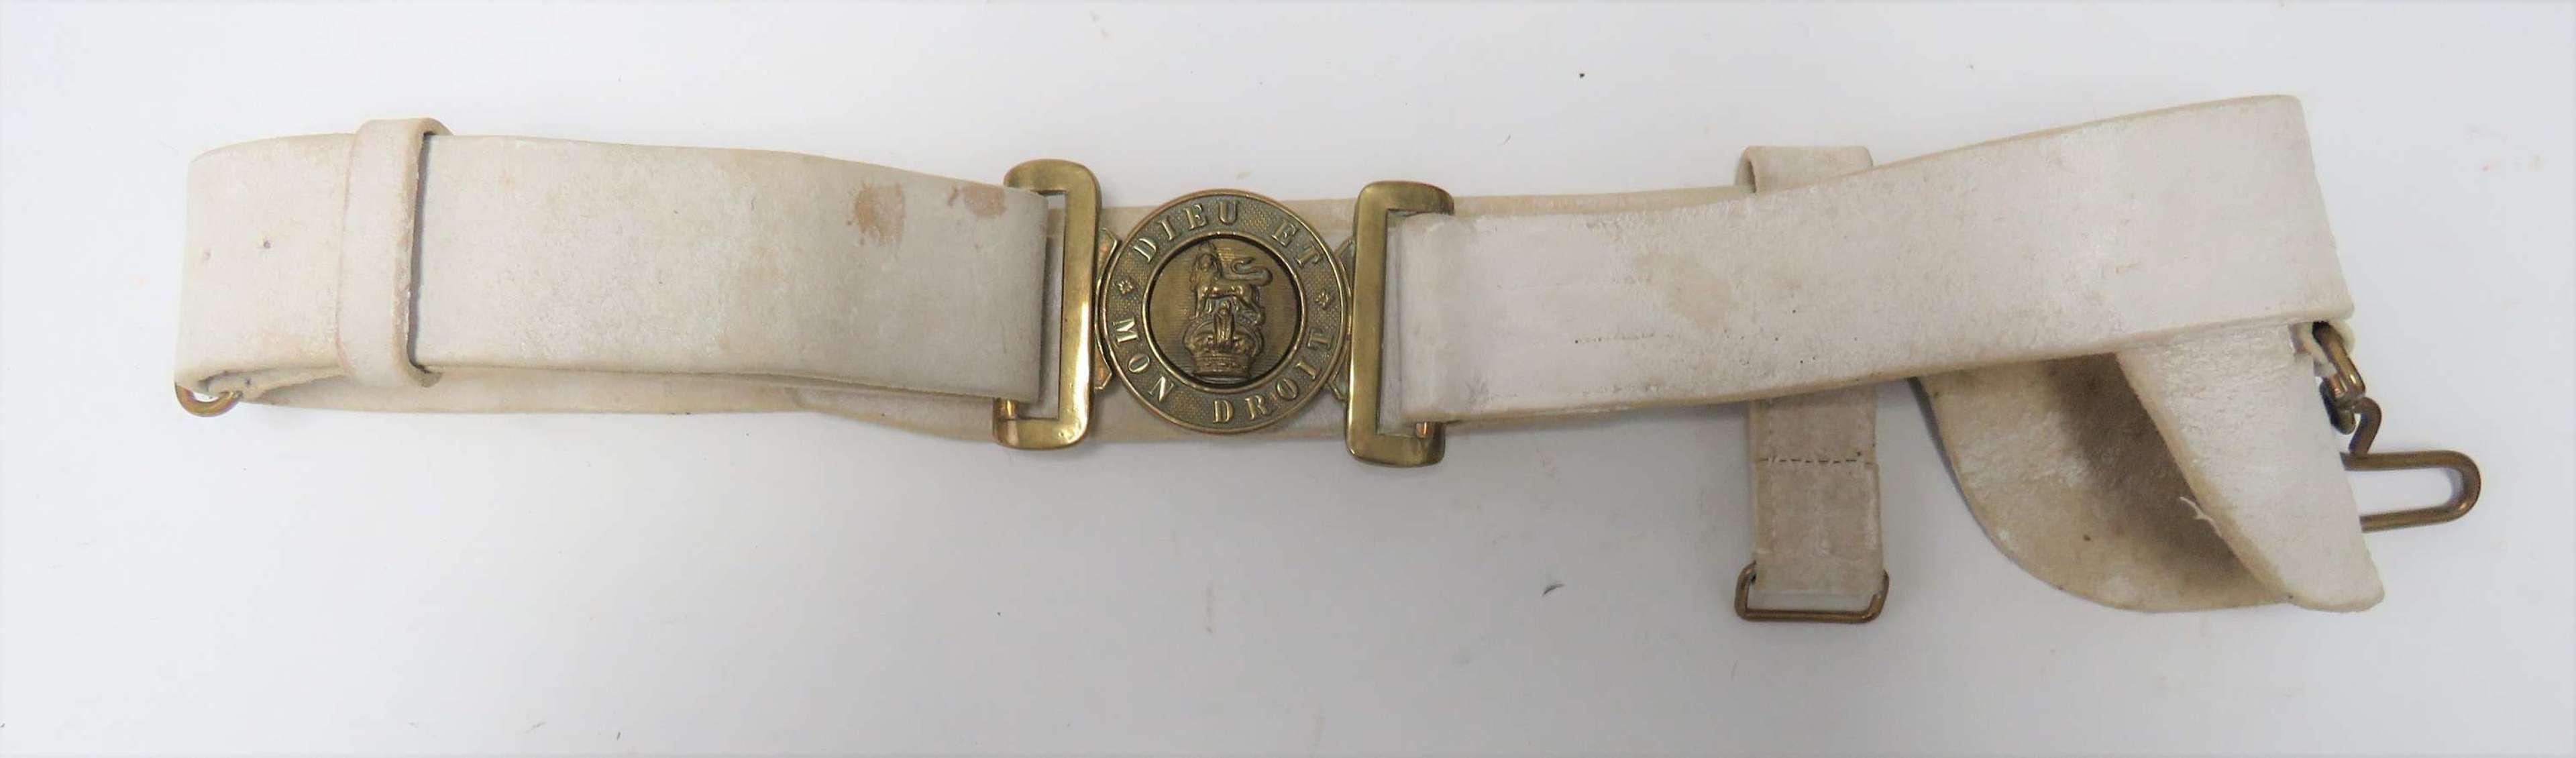 Post 1901 Senior N.C.O s Buff Leather Sword Belt